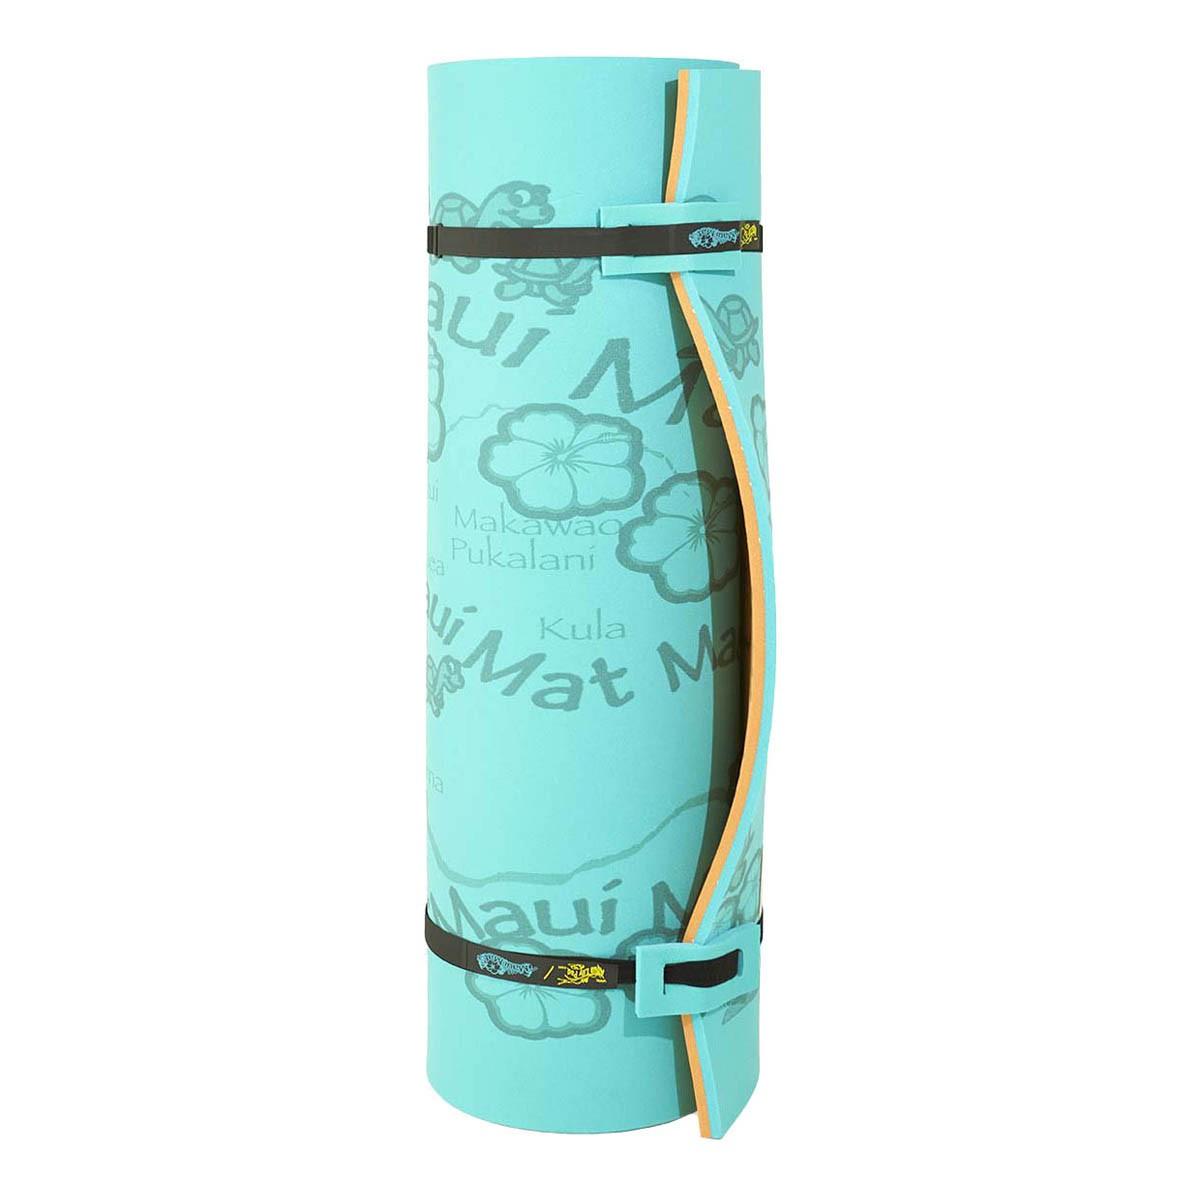 "Aqua Lily 3-Layer Big Kahuna Pad - 22' x 6' x 1 3/4"" (3 Layer)"